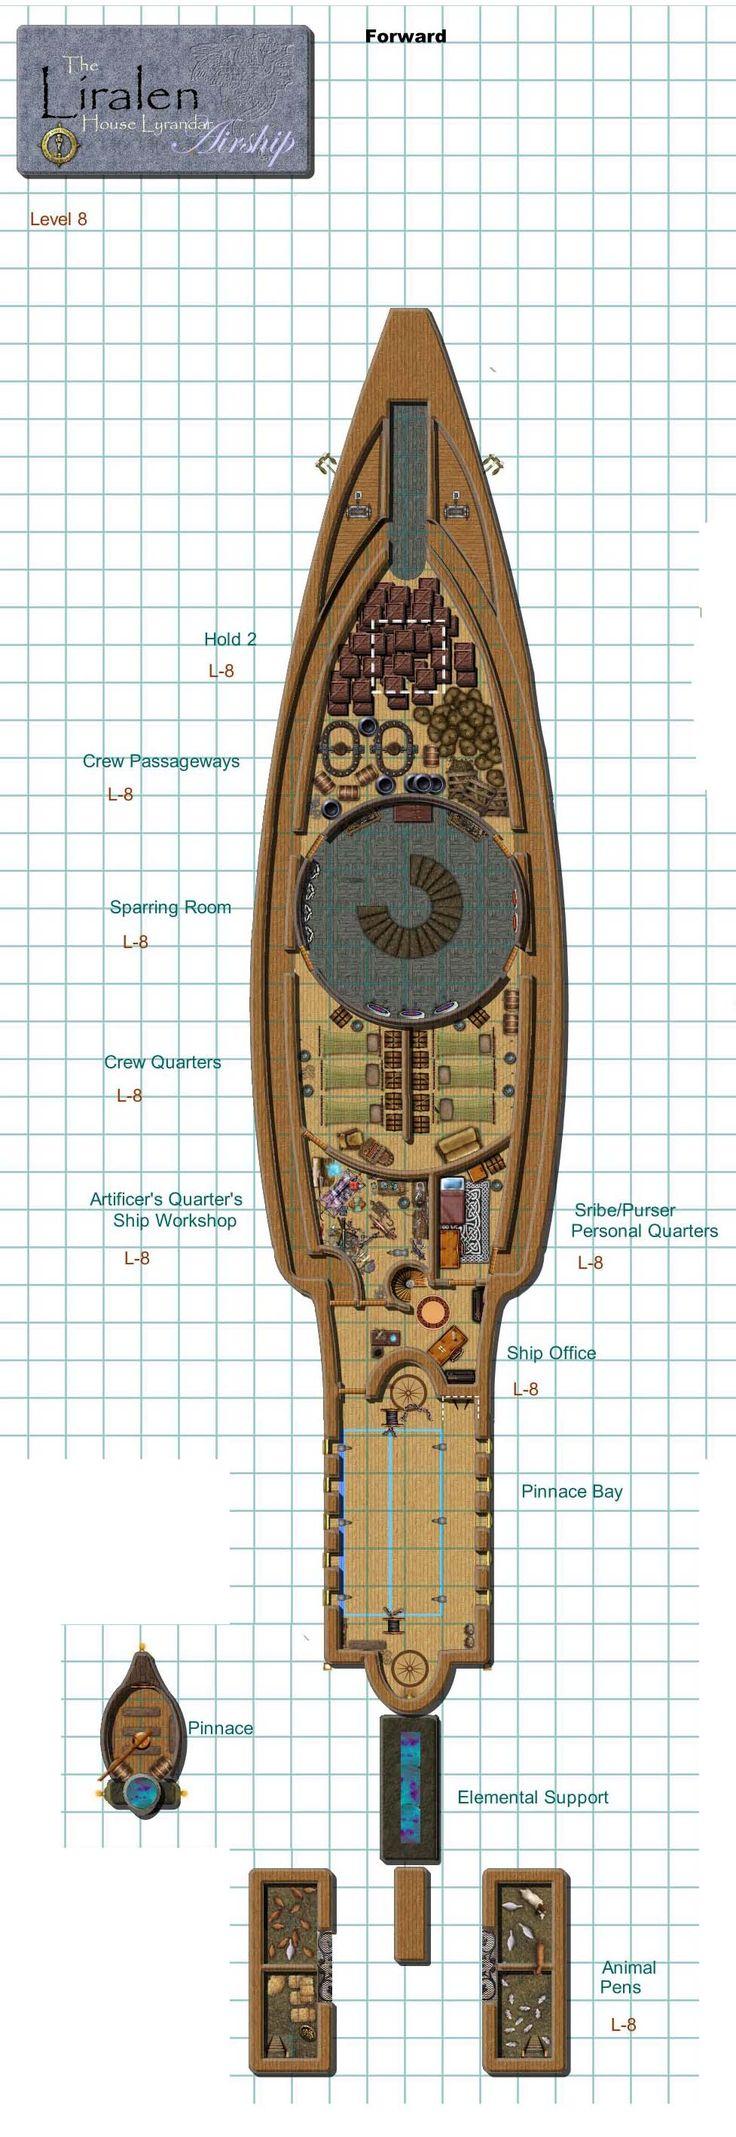 Dundjinni Mapping Software - Forums: House Lyrandar Airship